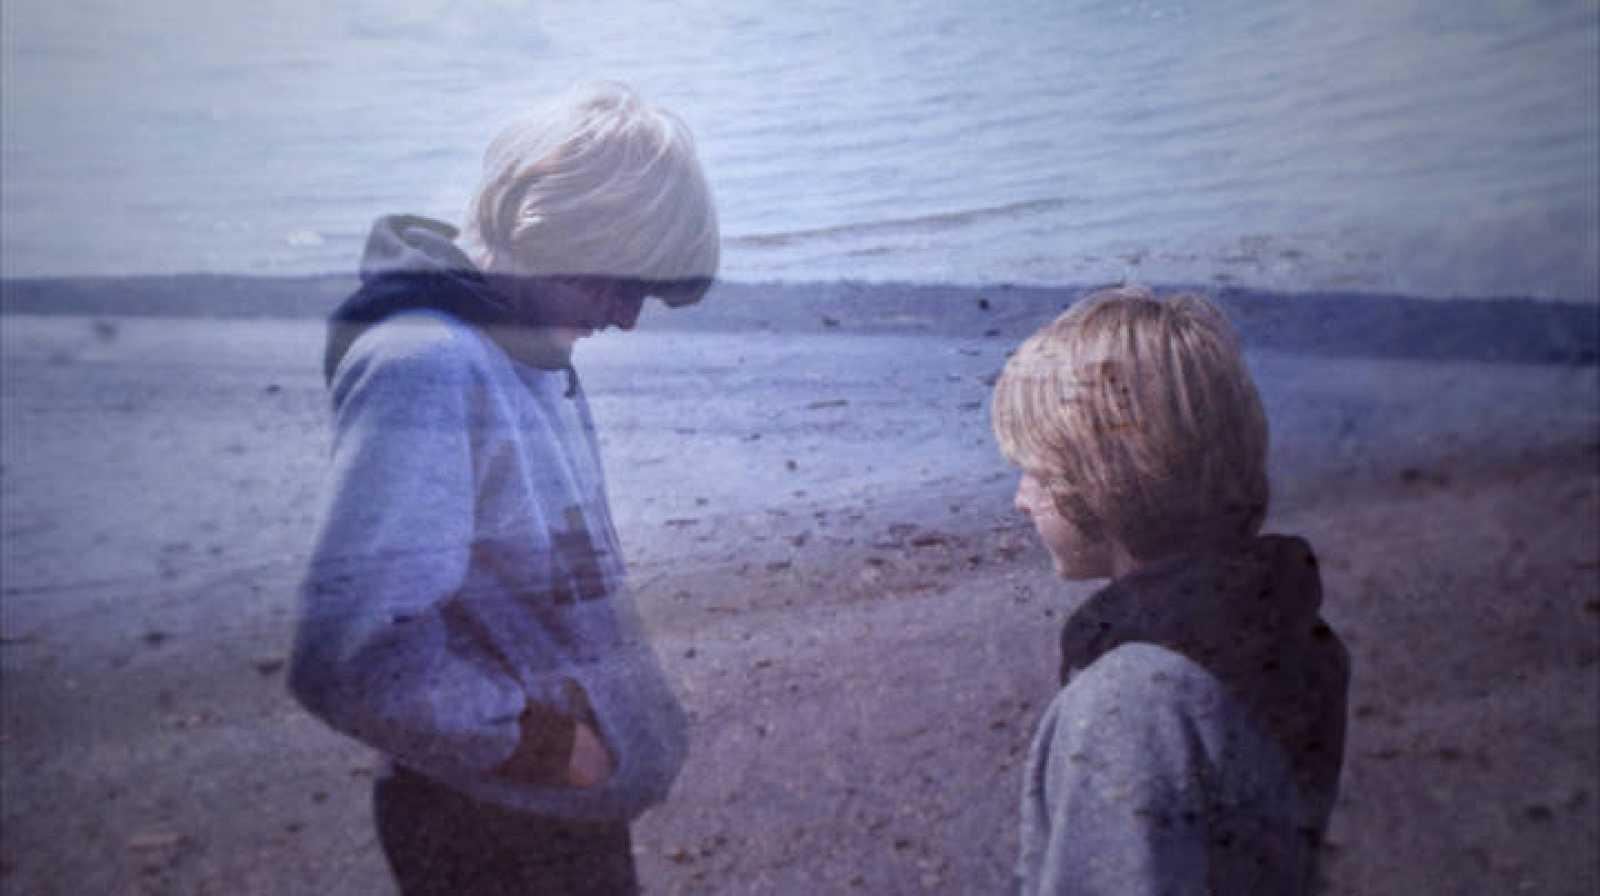 RTVE.es te invita al preestreno del documental sobre Kurt Cobain, 'Cobain: Montage of Heck'